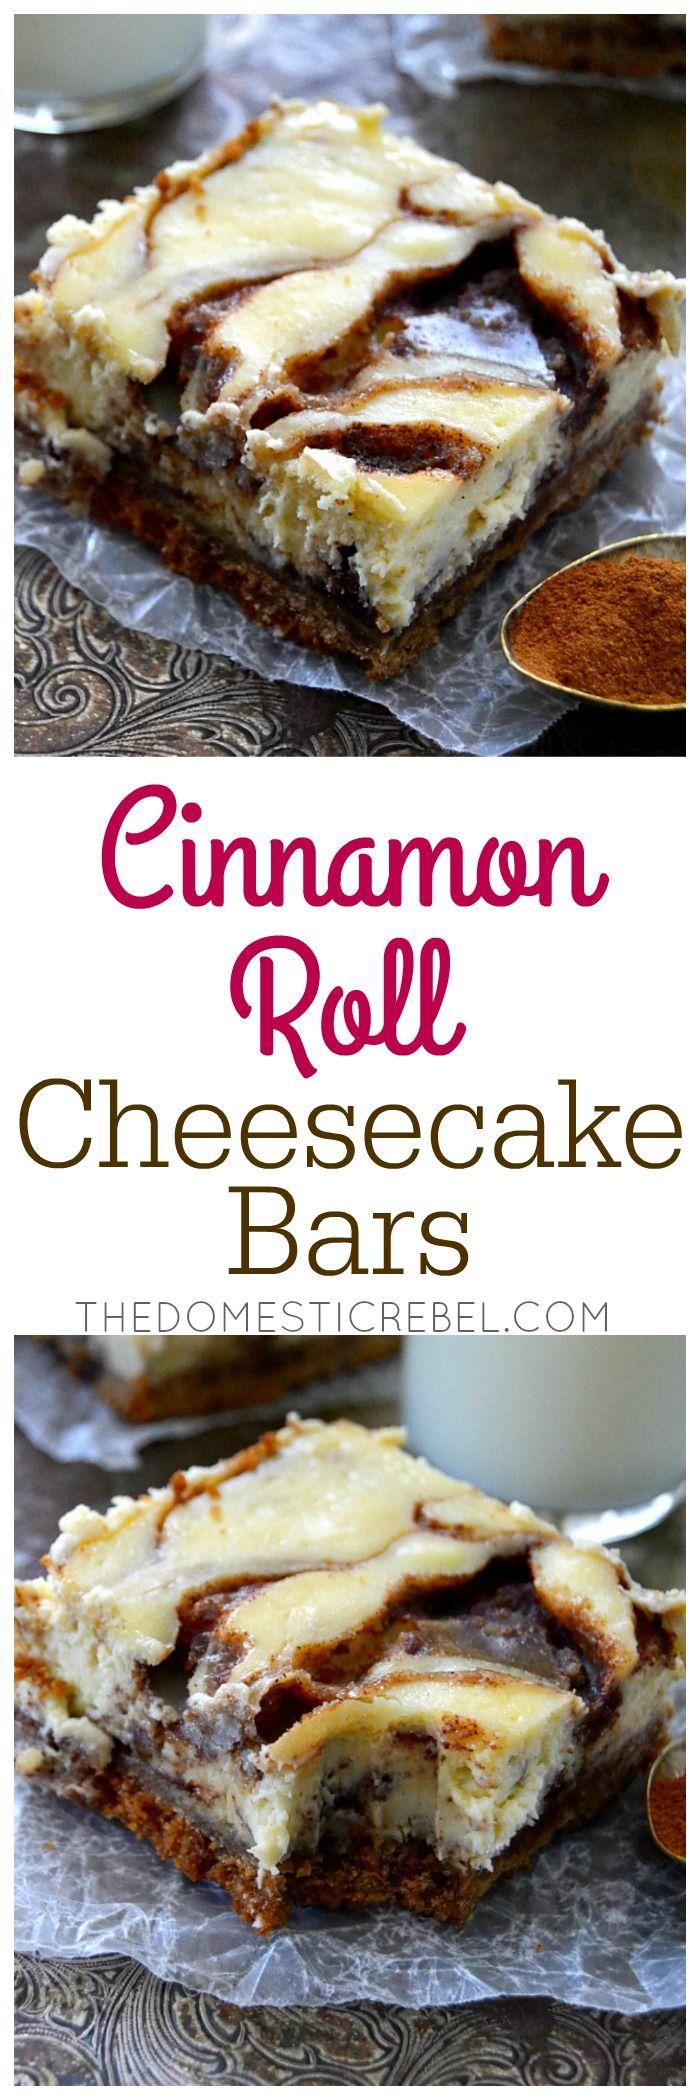 These Cinnamon Roll Cheesecake Bars definitely qualify as breakfast! This EASY recipe tastes just like gooey cinnamon rolls but in a creamy cheesecake bar!